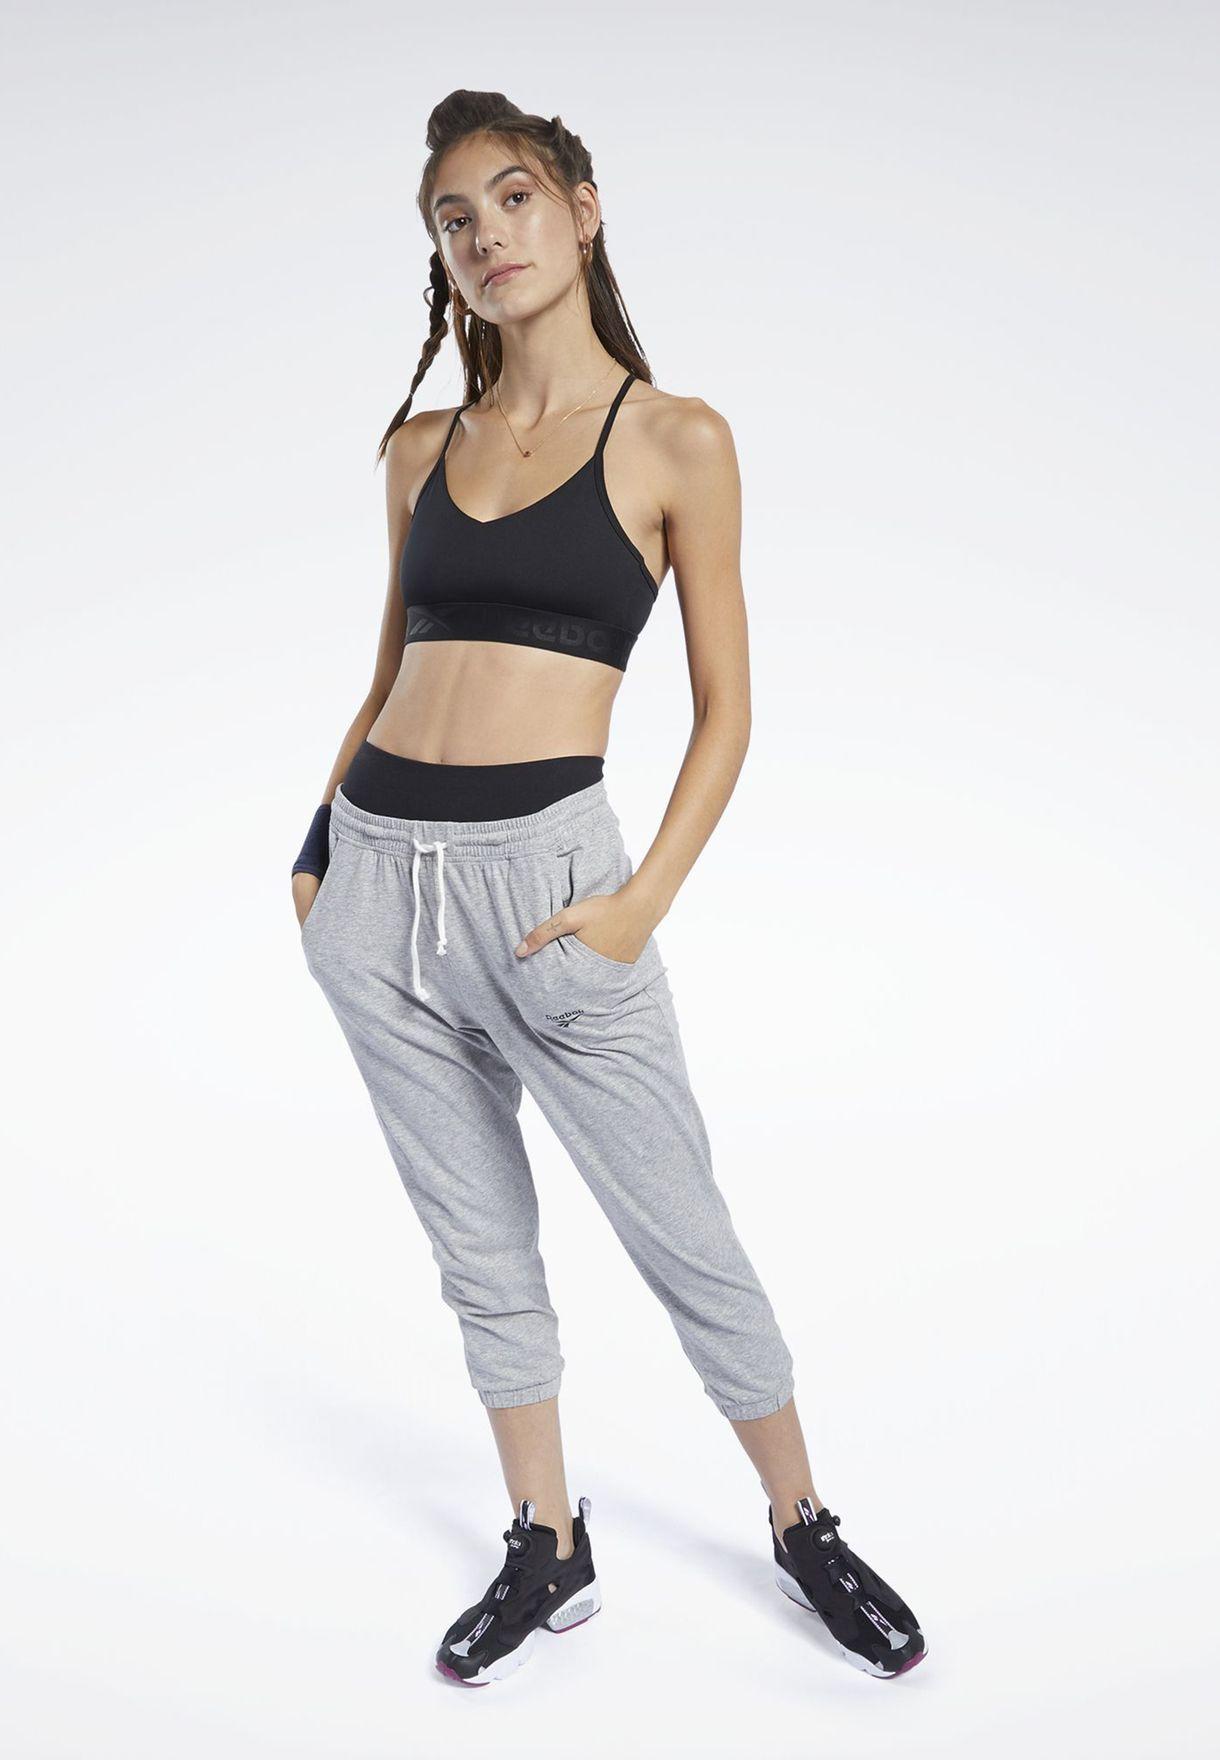 Workout Ready Strappy Bra